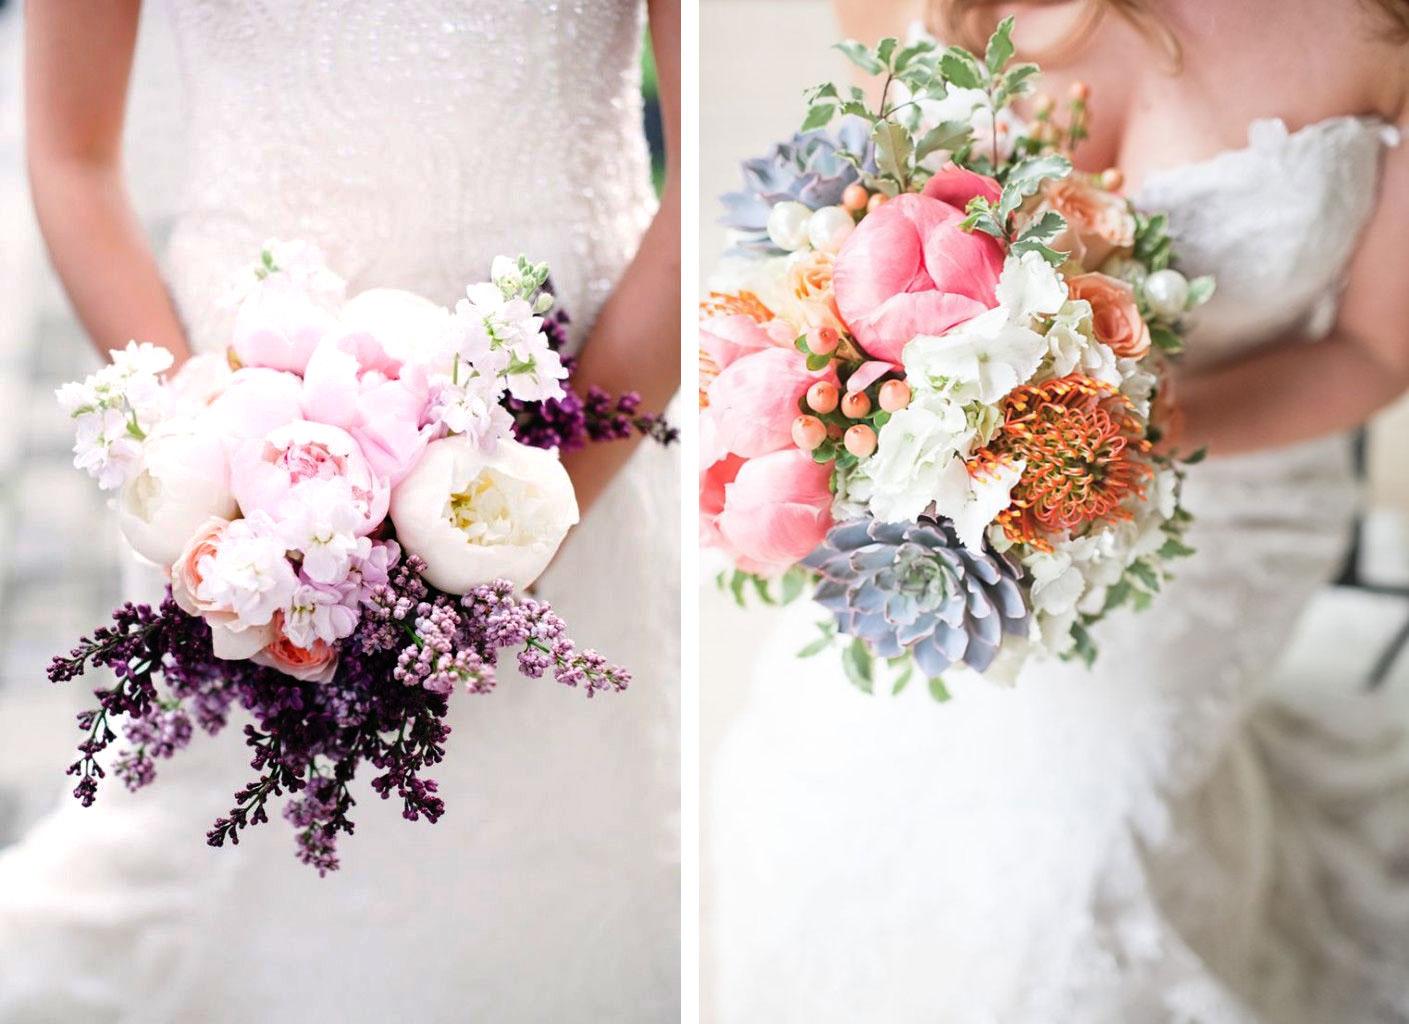 Wedding Flowers & Bouquet Ideas - Wedding Planner, Wedding Venues ...